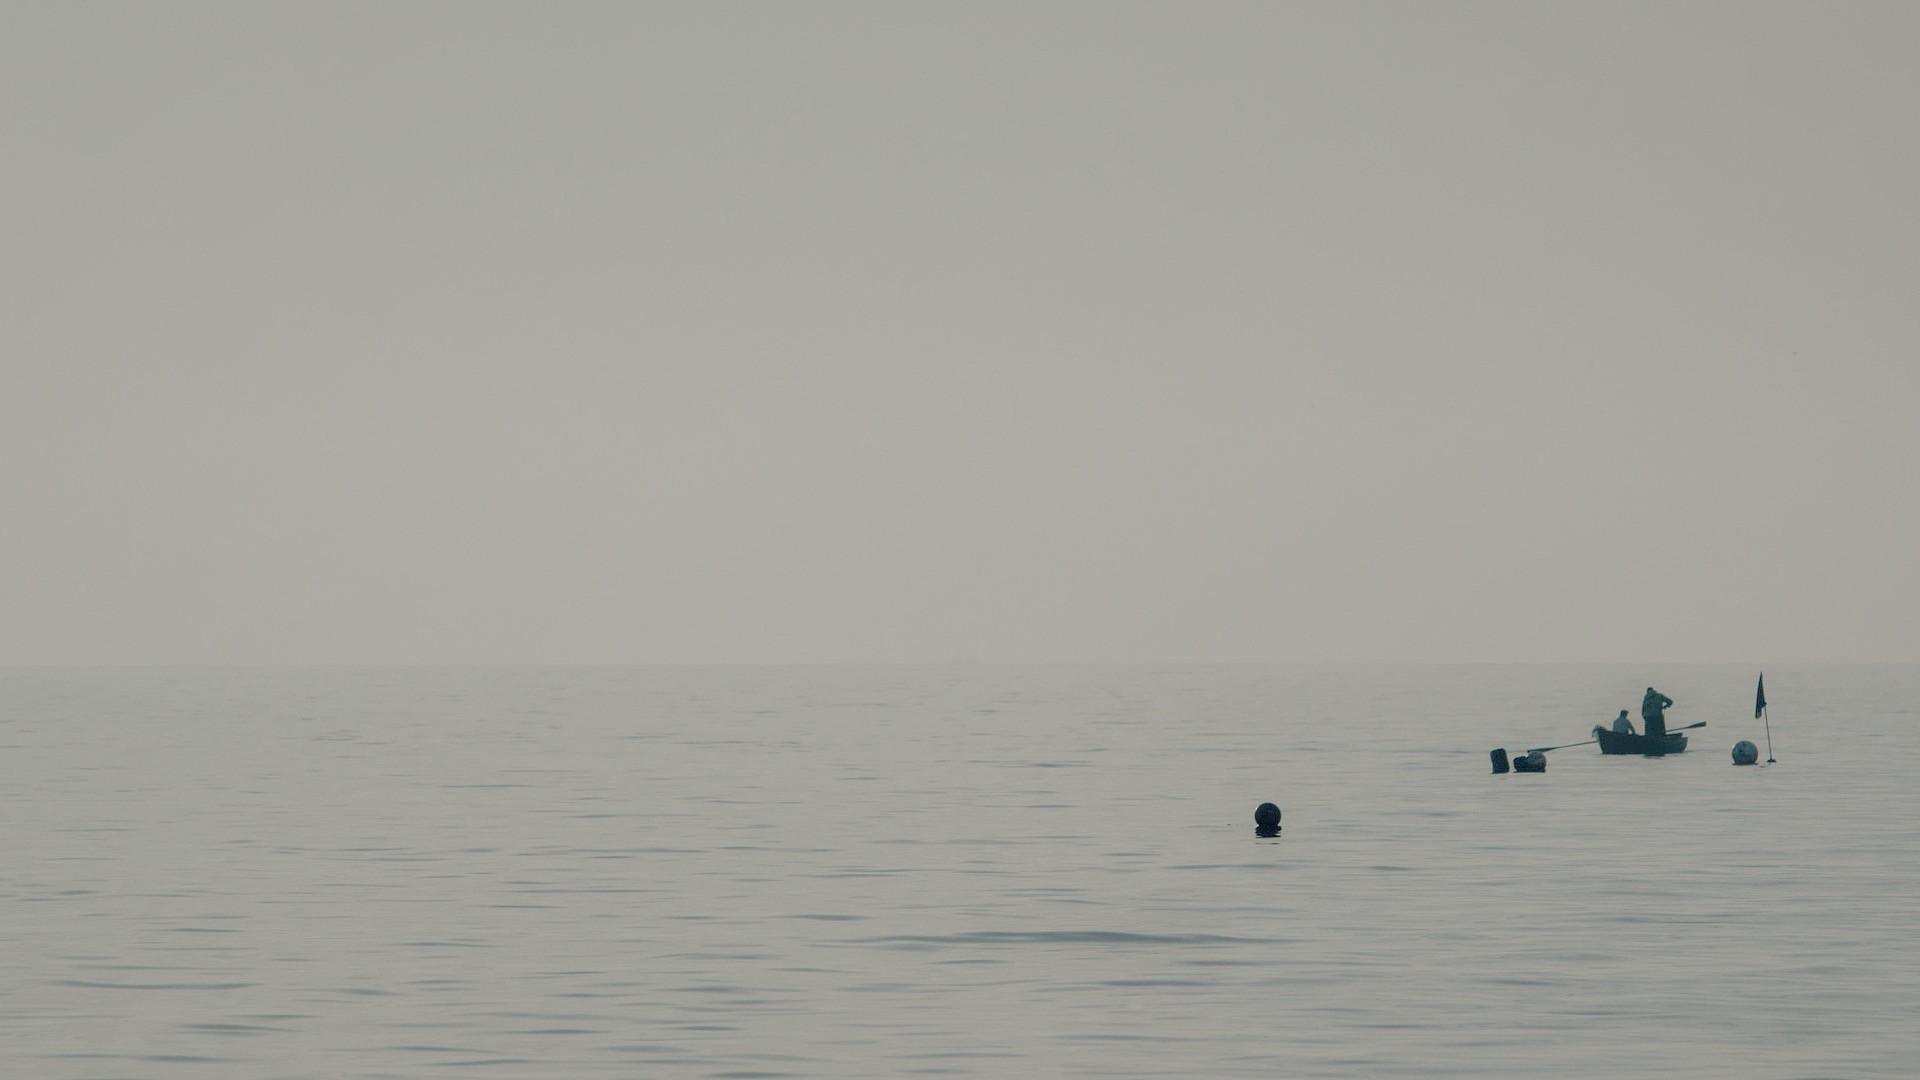 last fisherman - Award winning documentary film